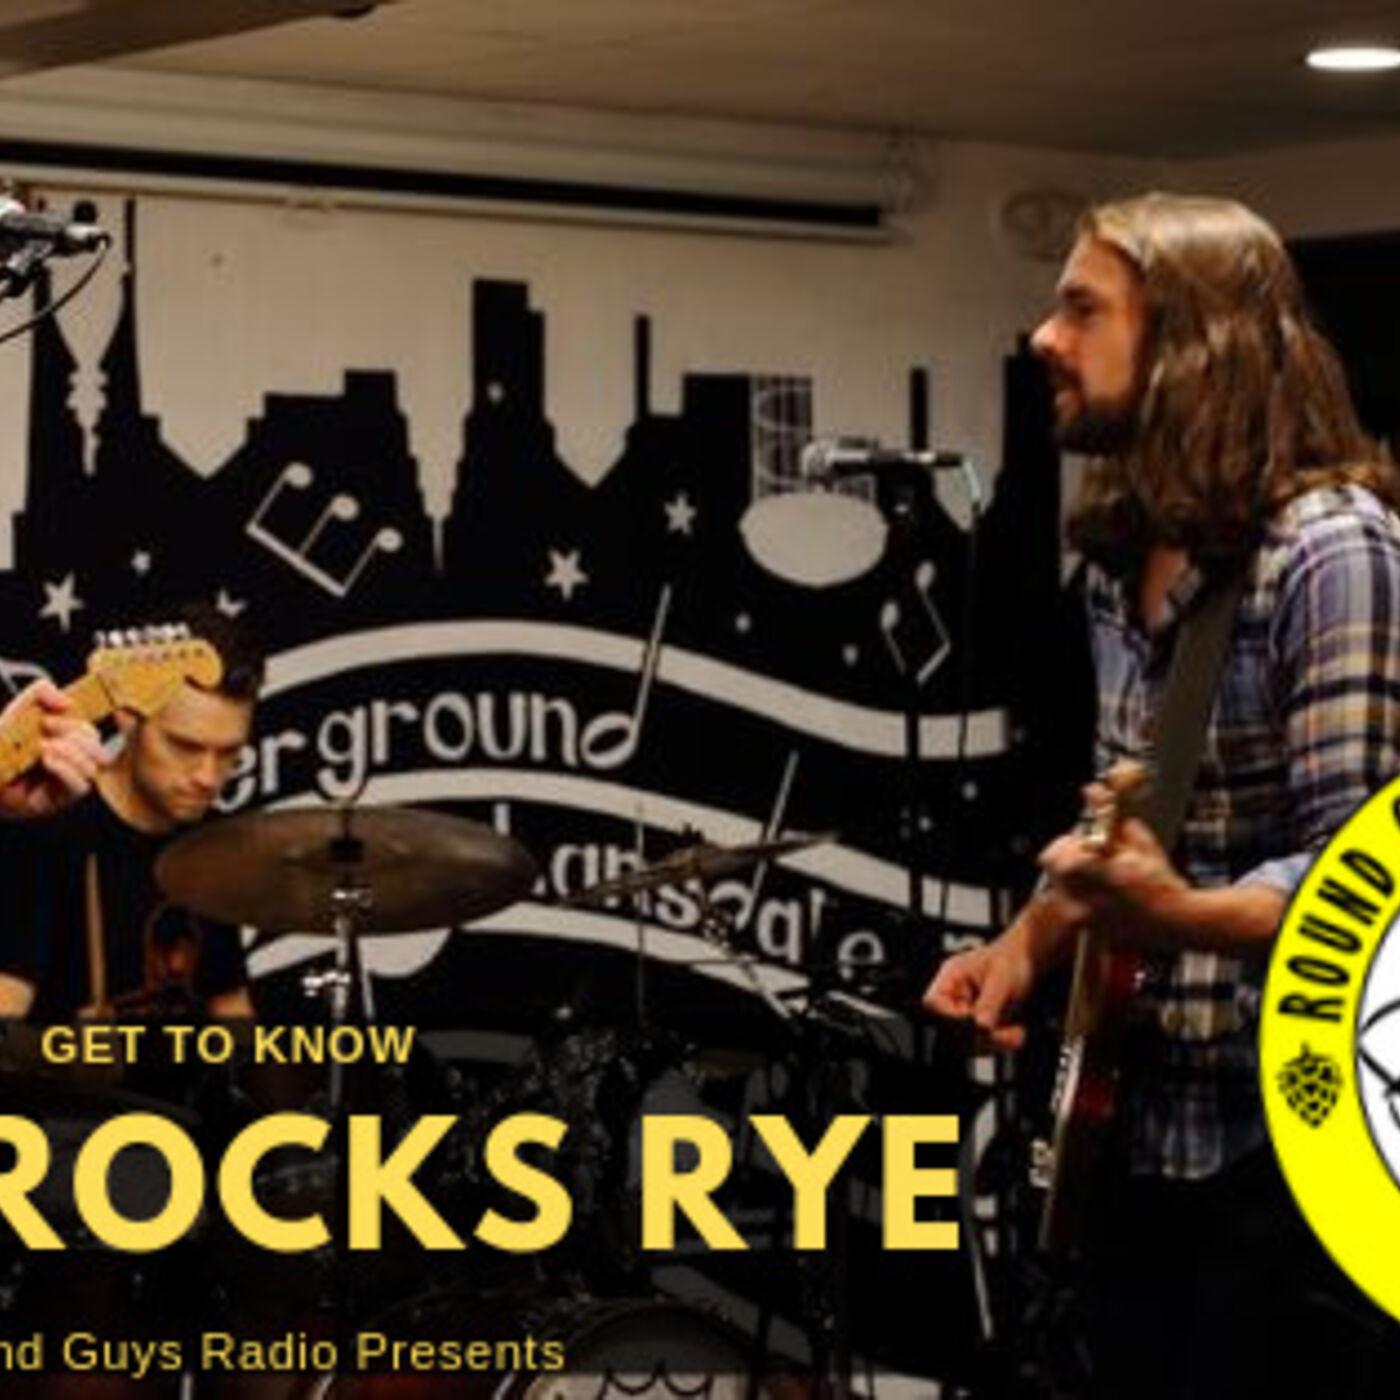 [Bonus] Take a Listen to Two Rocks Rye perform Everything Else